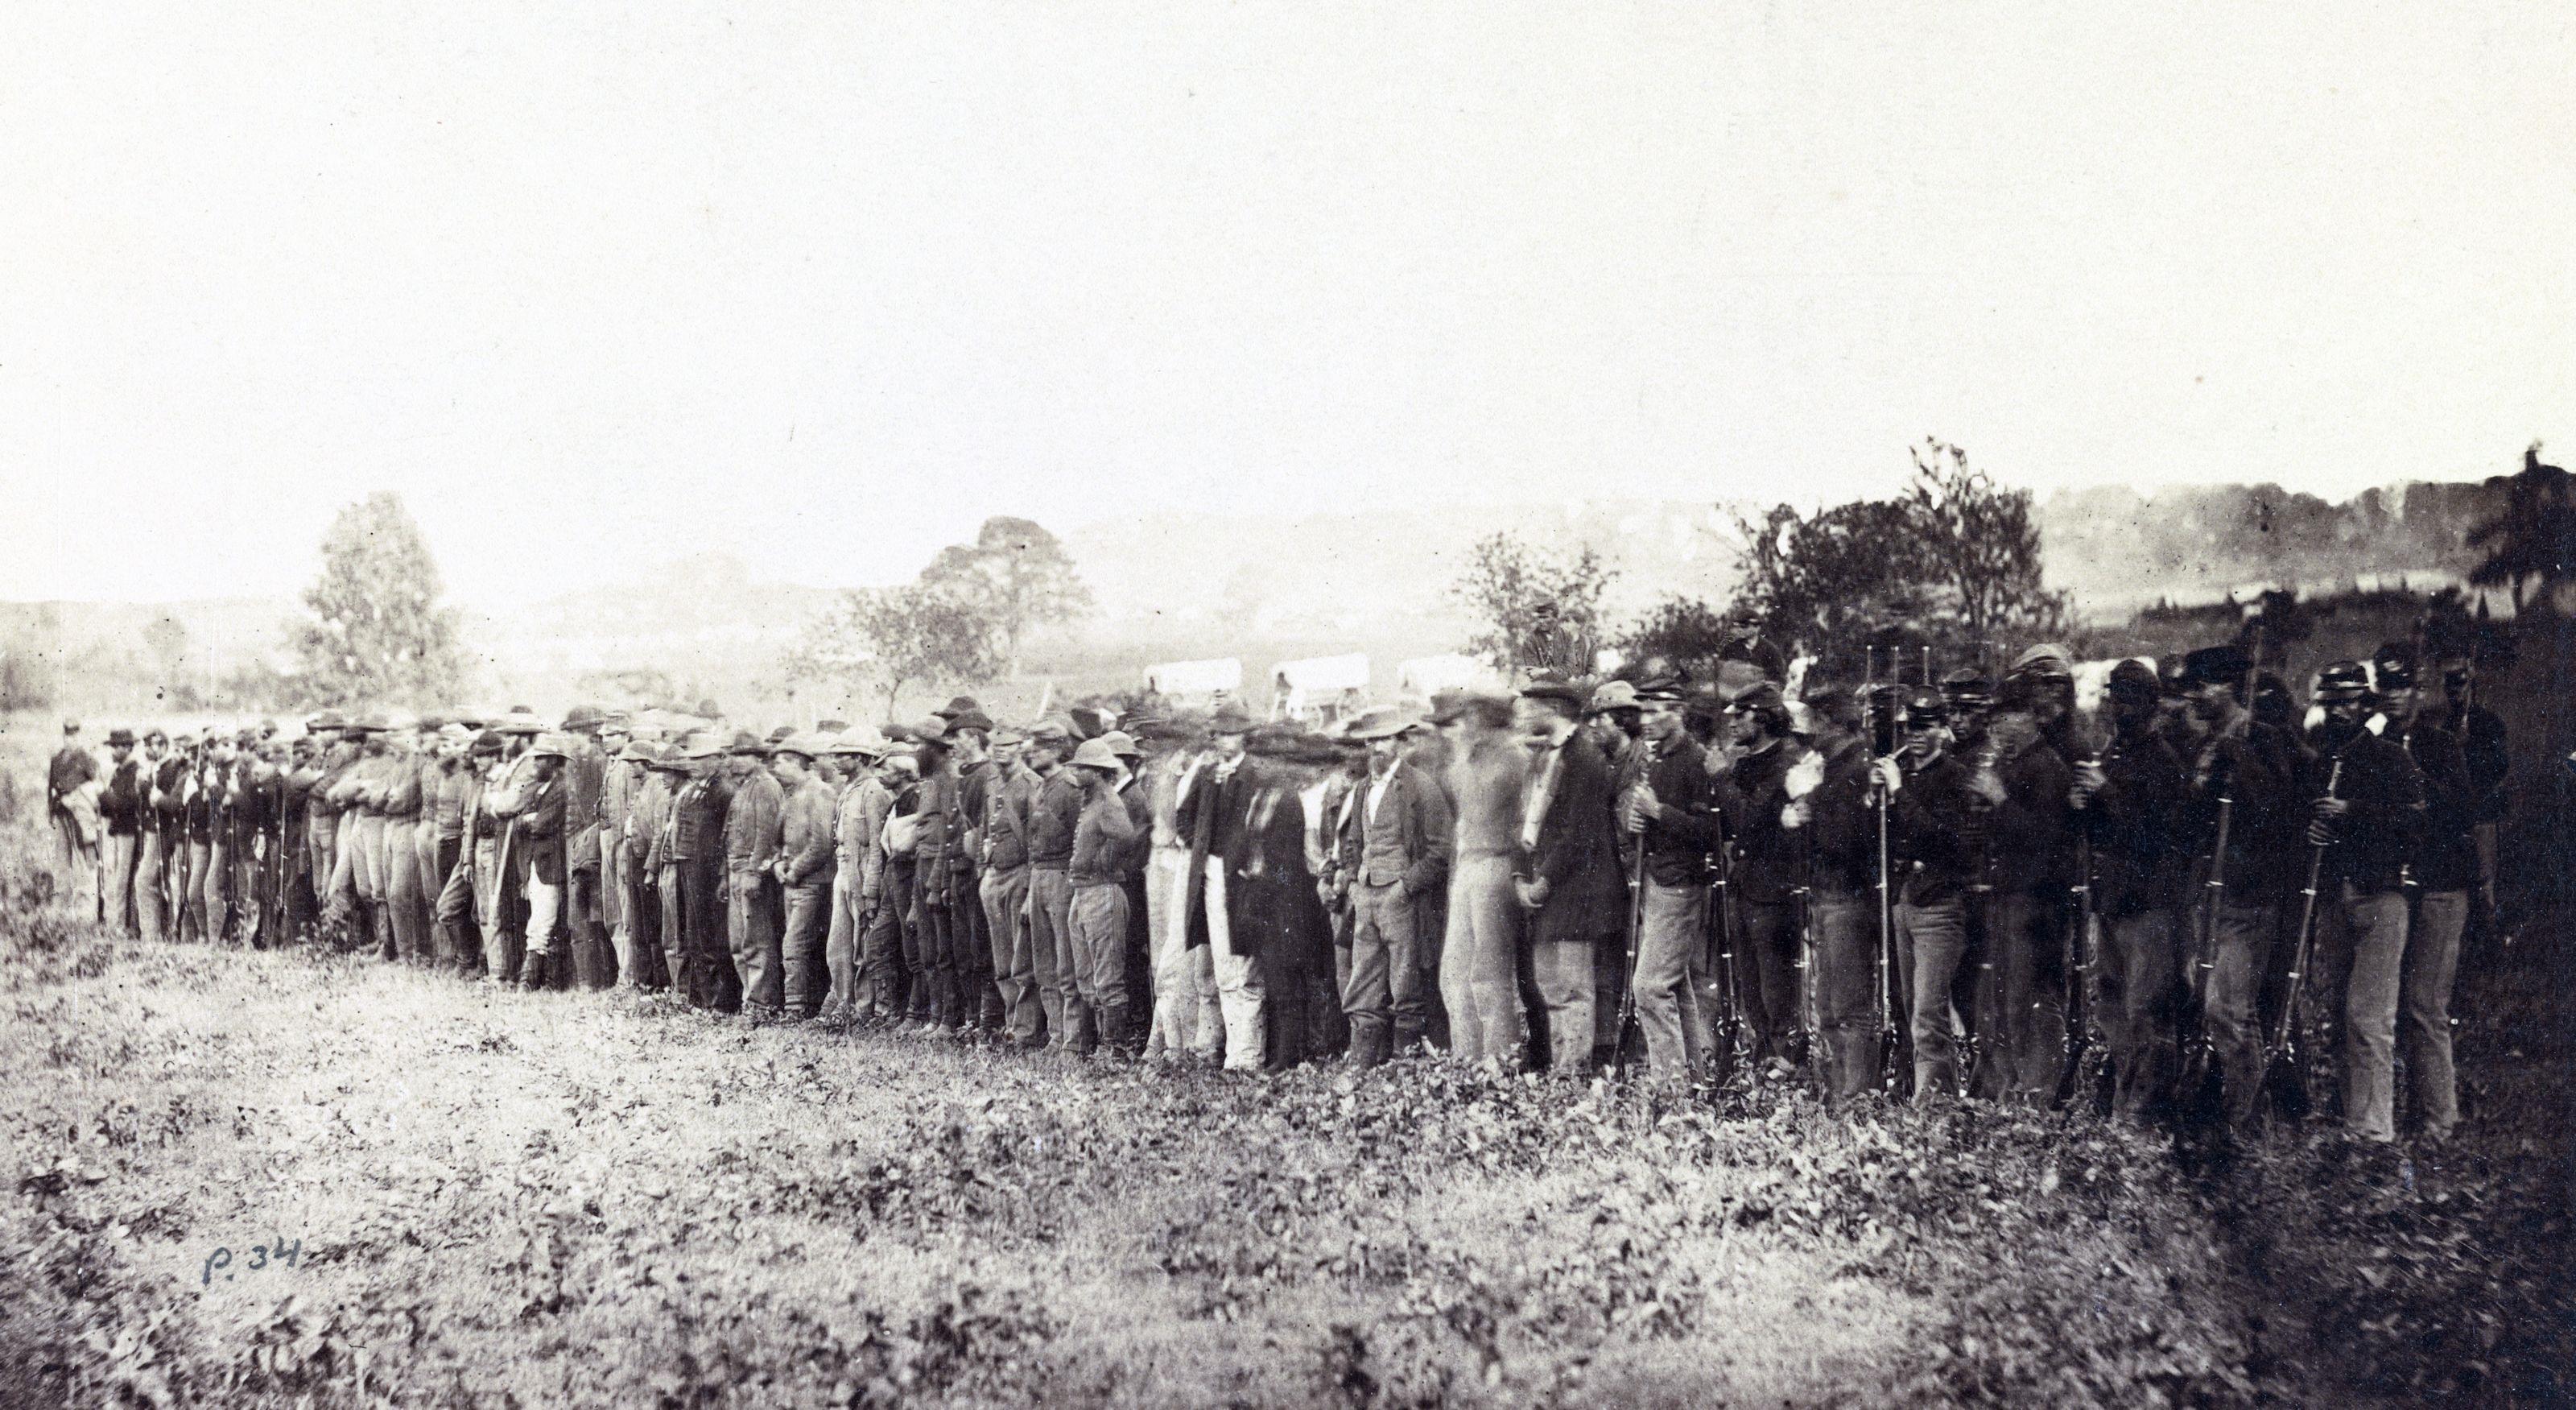 Prisonniers June-17-Battle-of-Aldie-prisoners